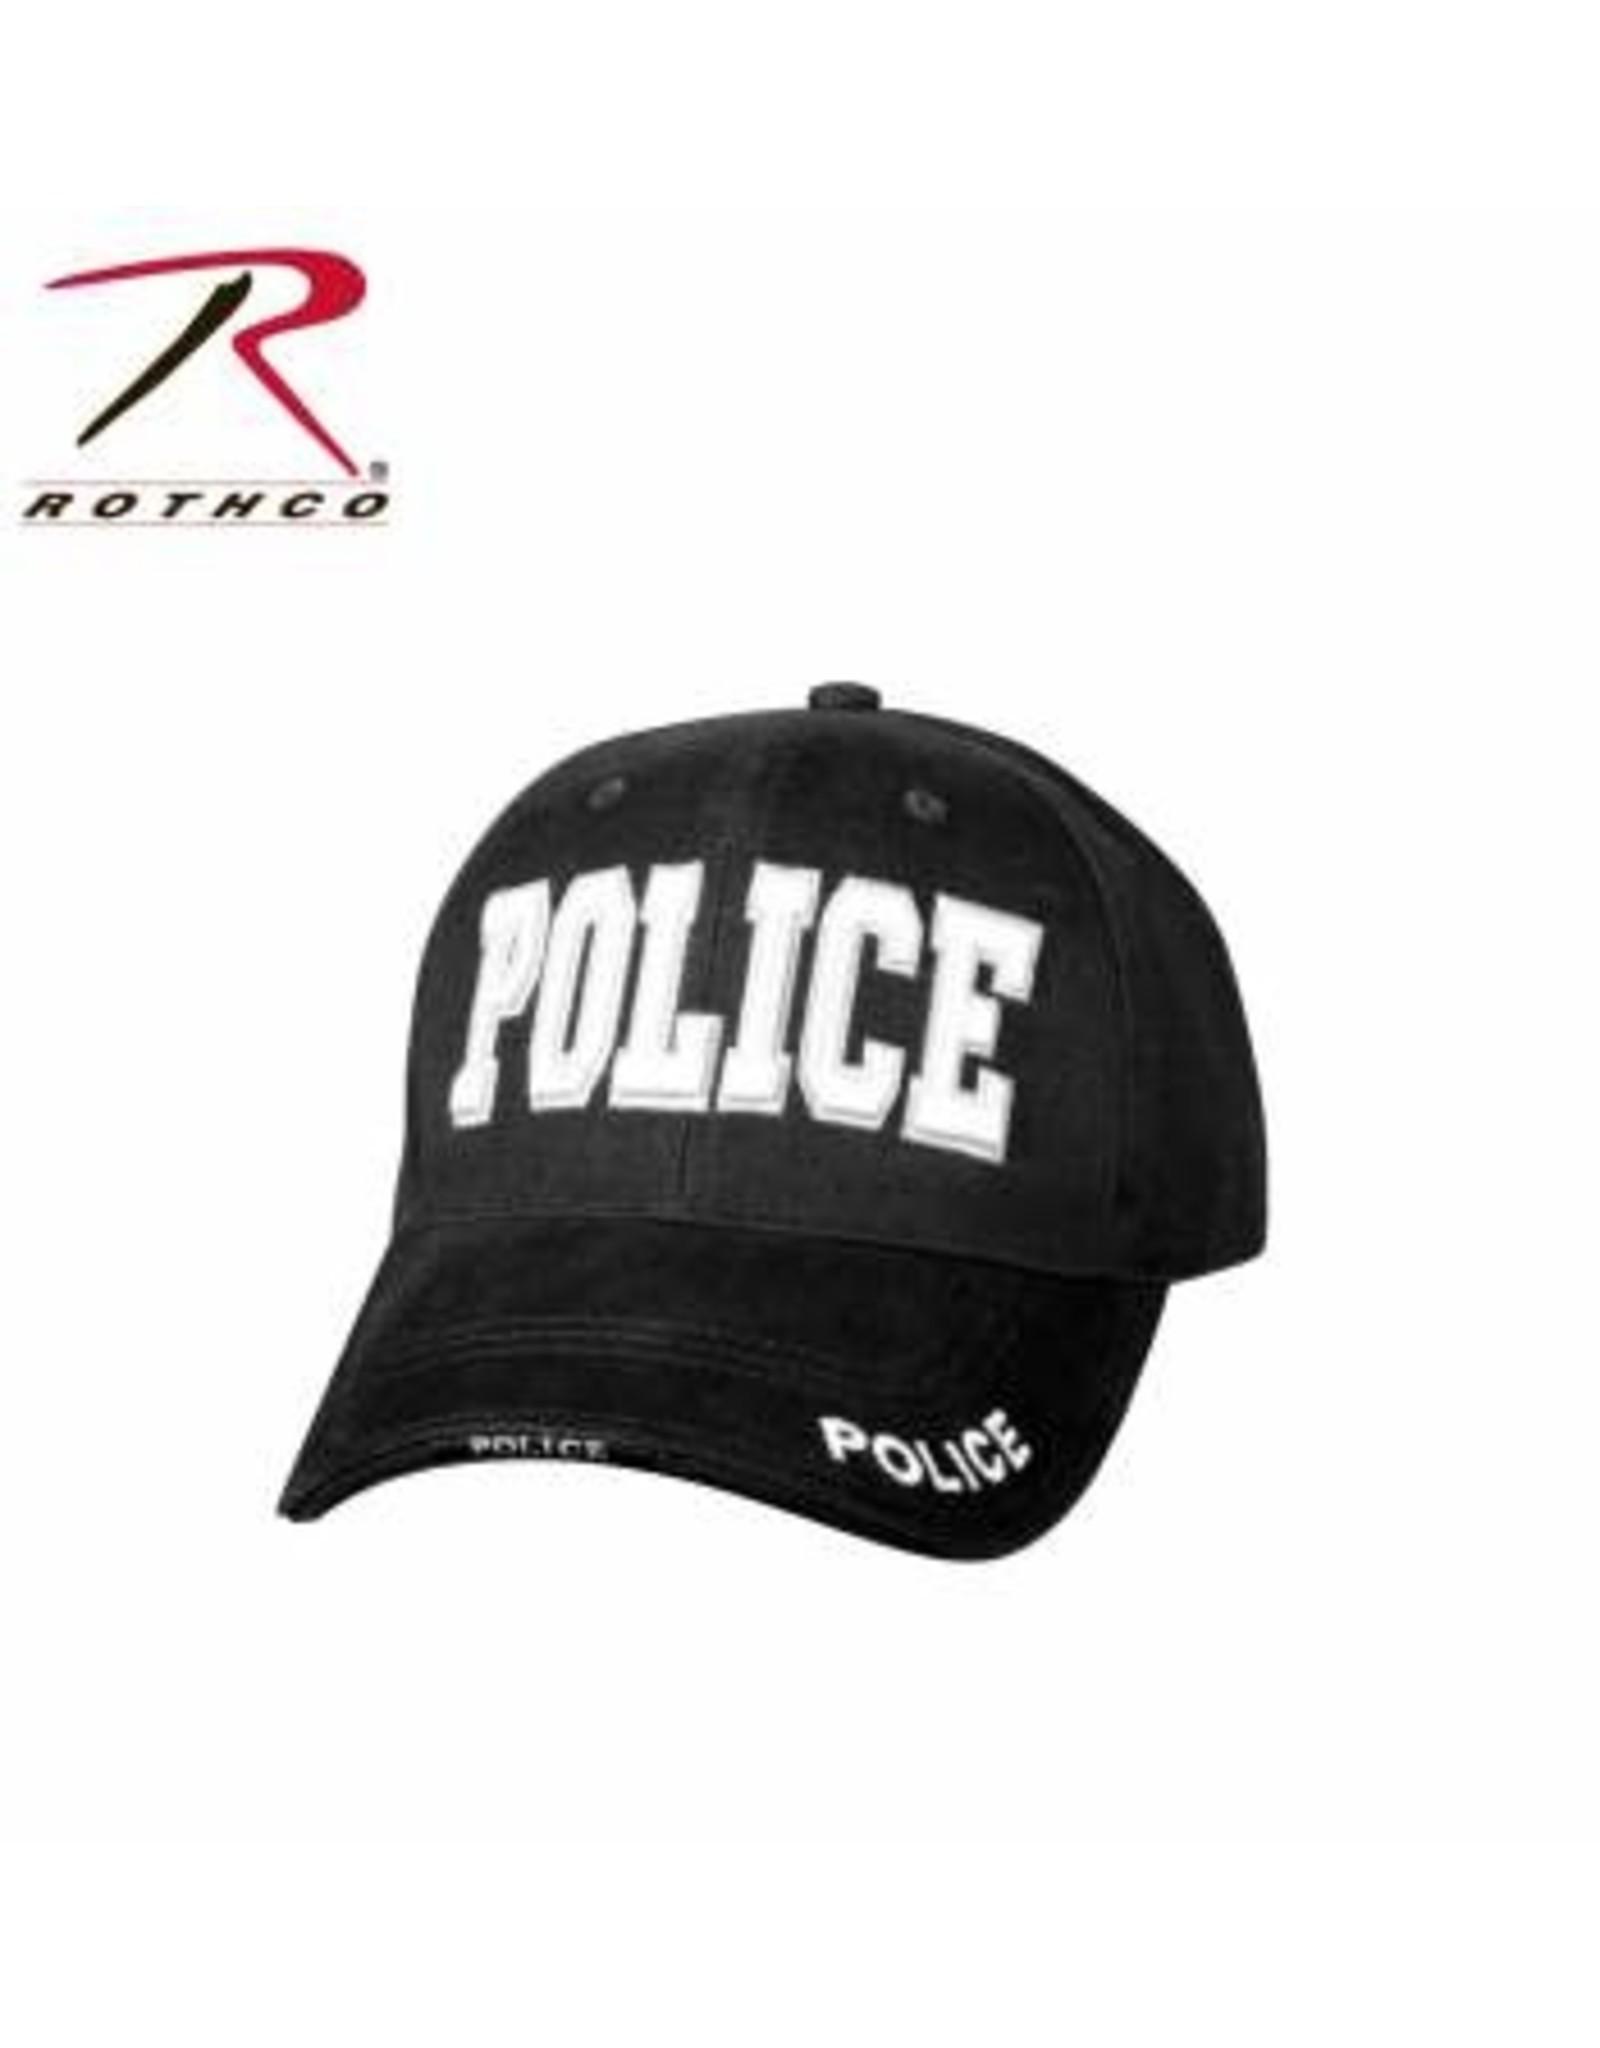 ROTHCO POLICE Baseball cap - Black